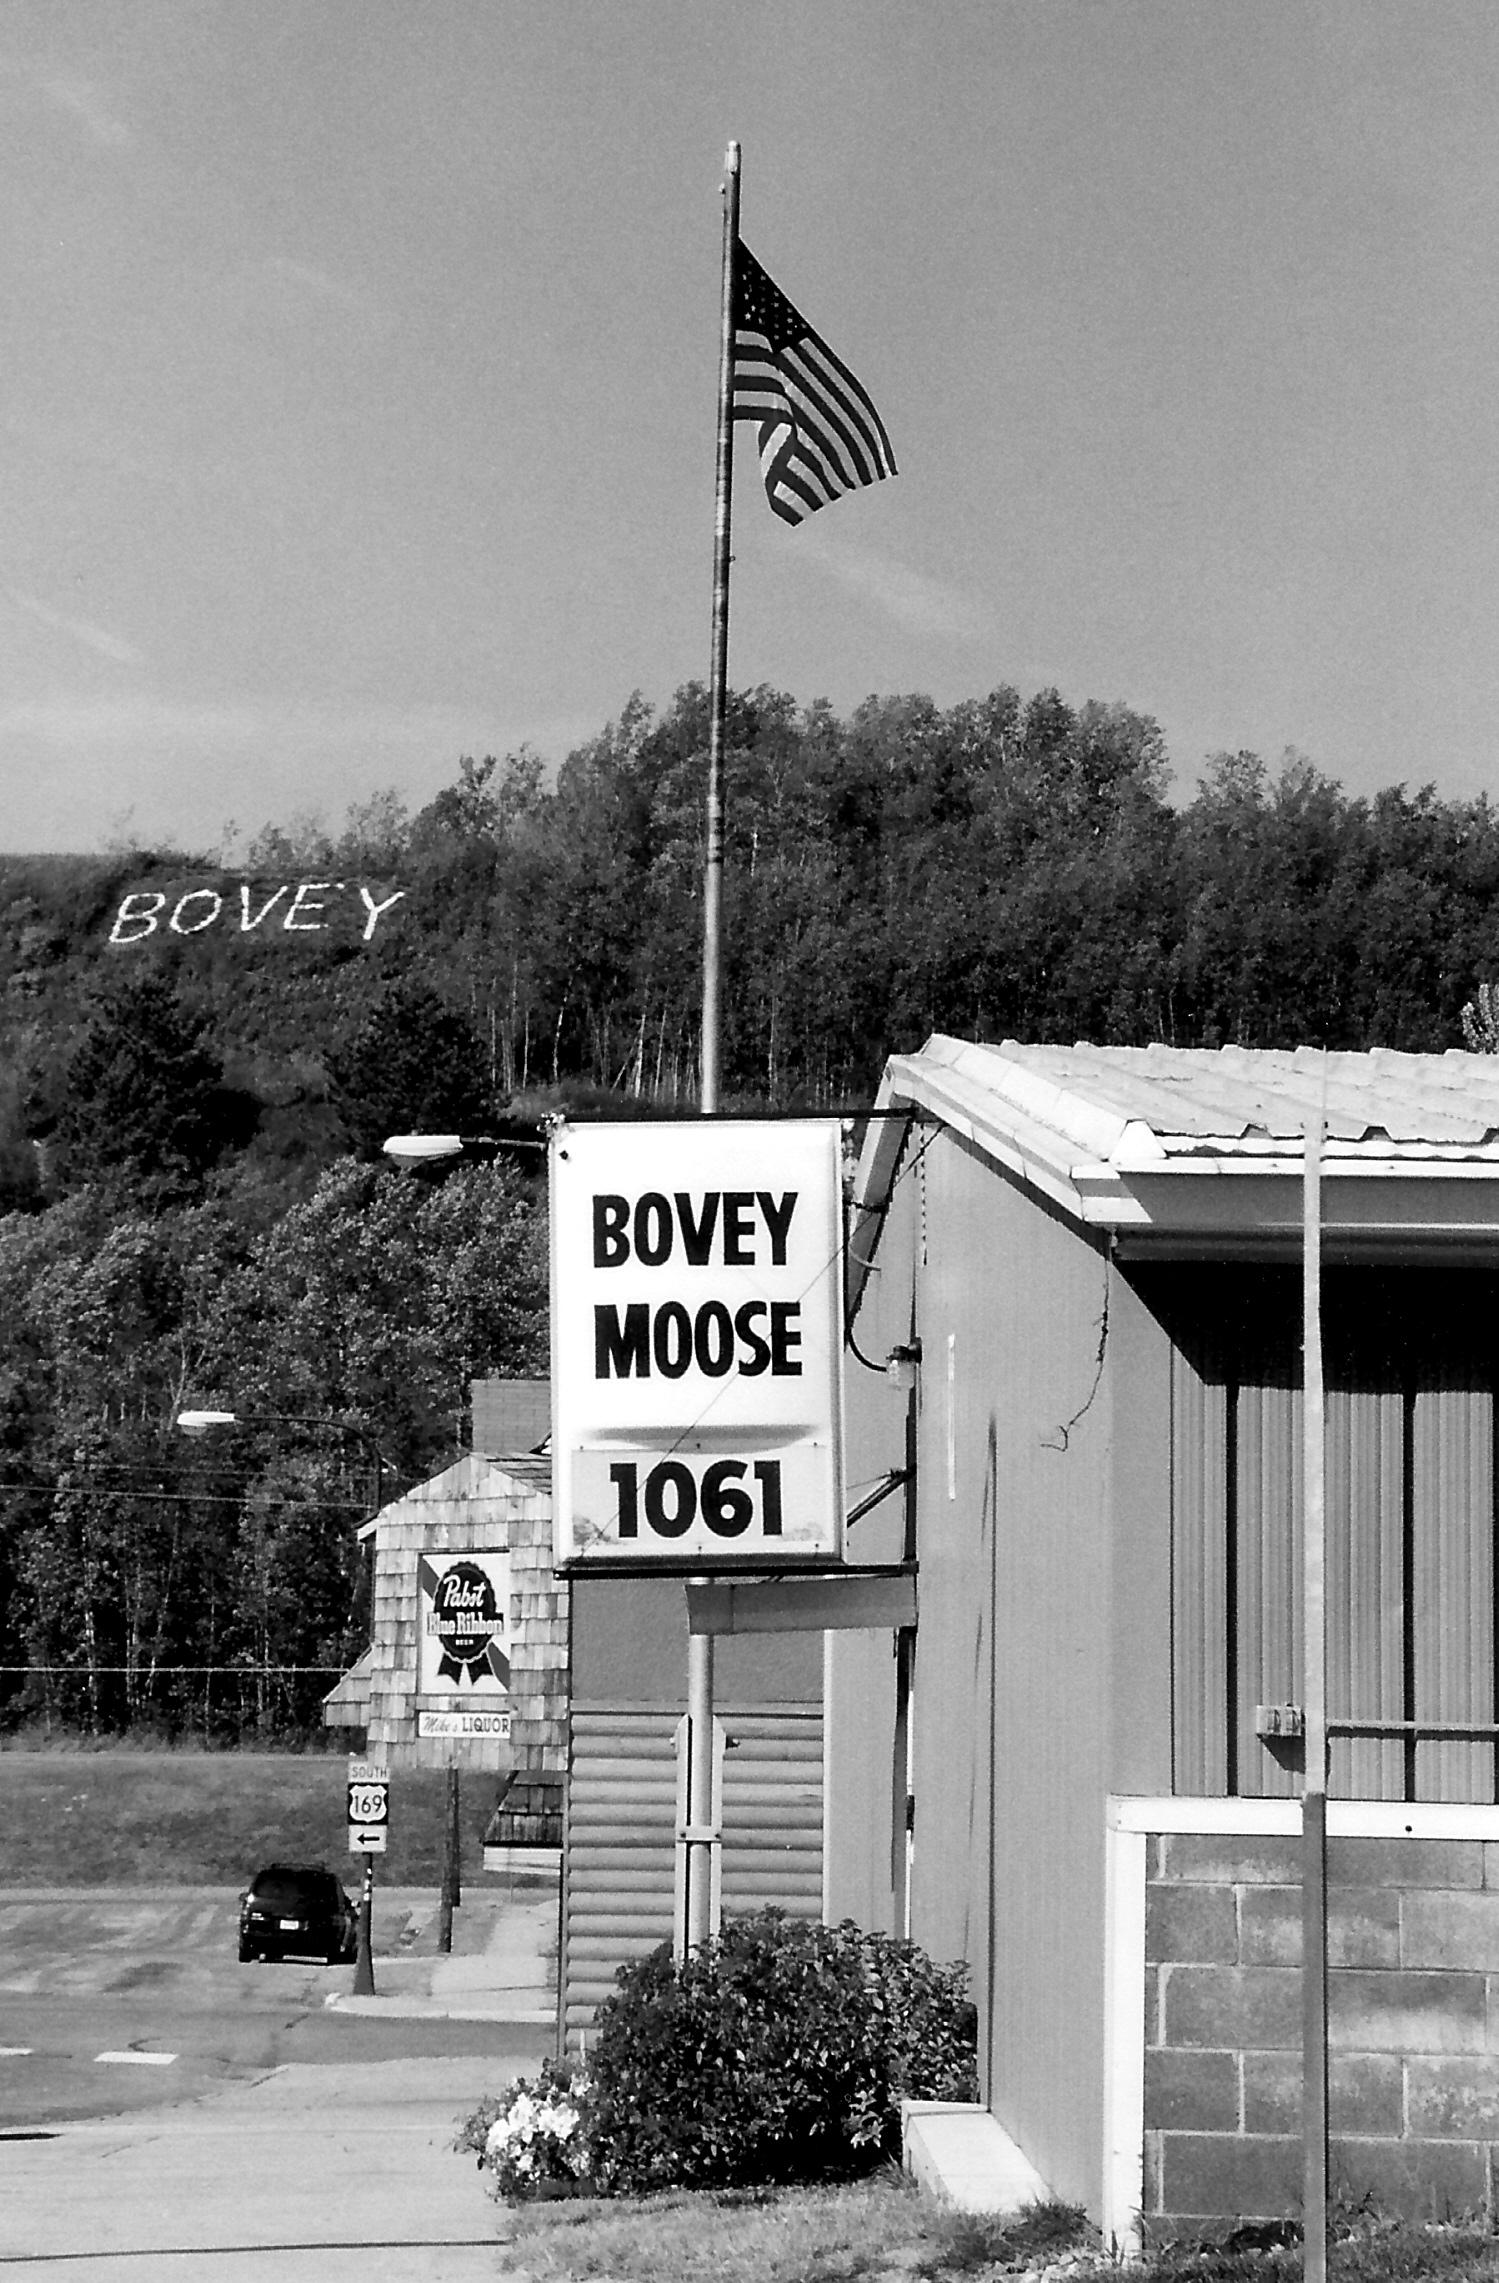 Bovey Moose